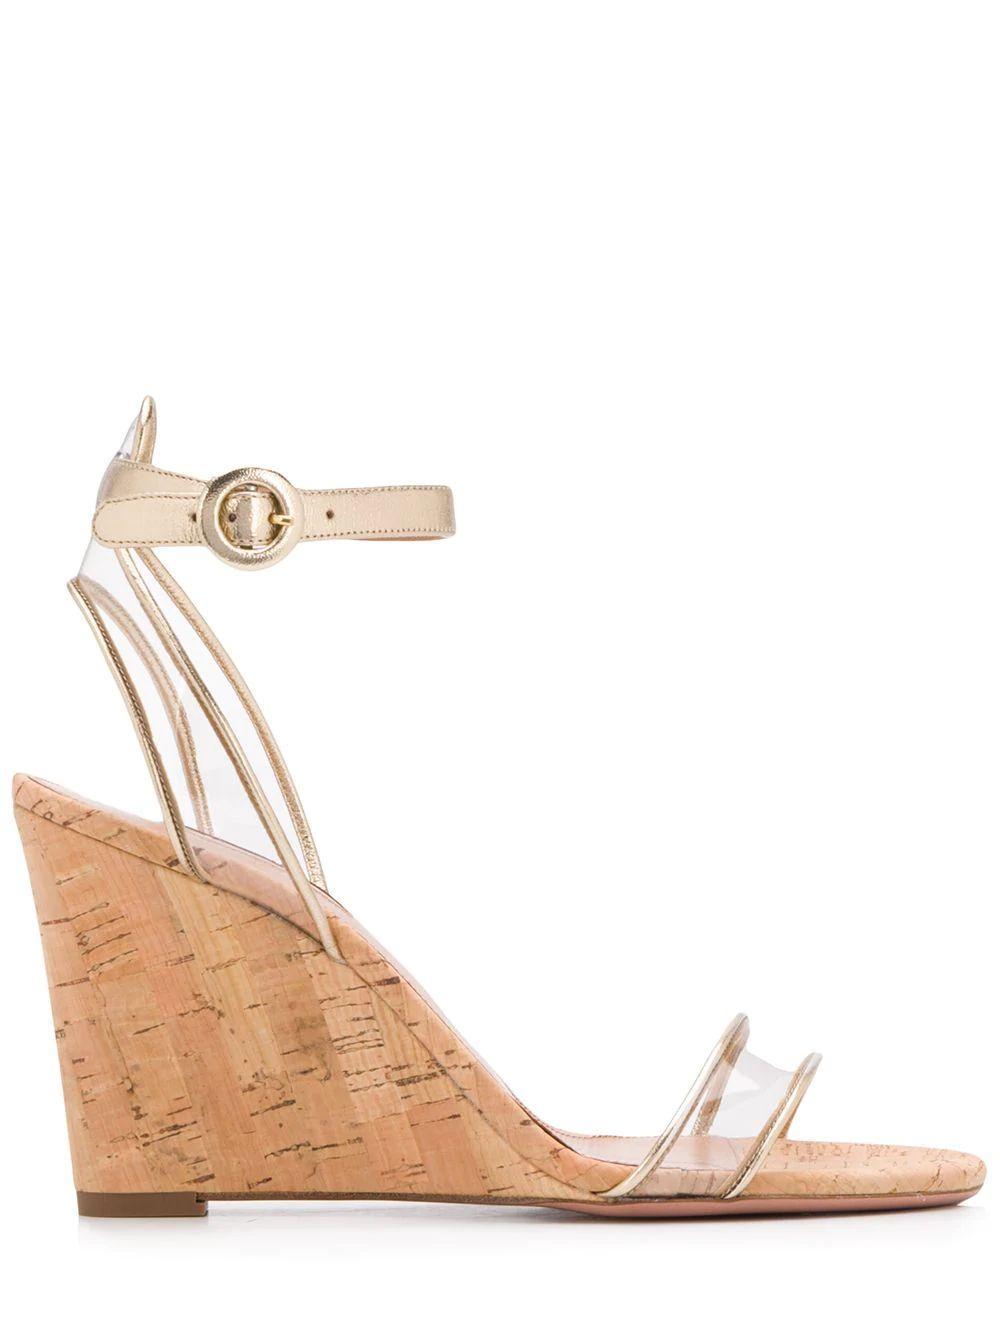 Minimalist Leather/Pvc 85mm Wedge Sandal Item # MINMIDW0-NLP